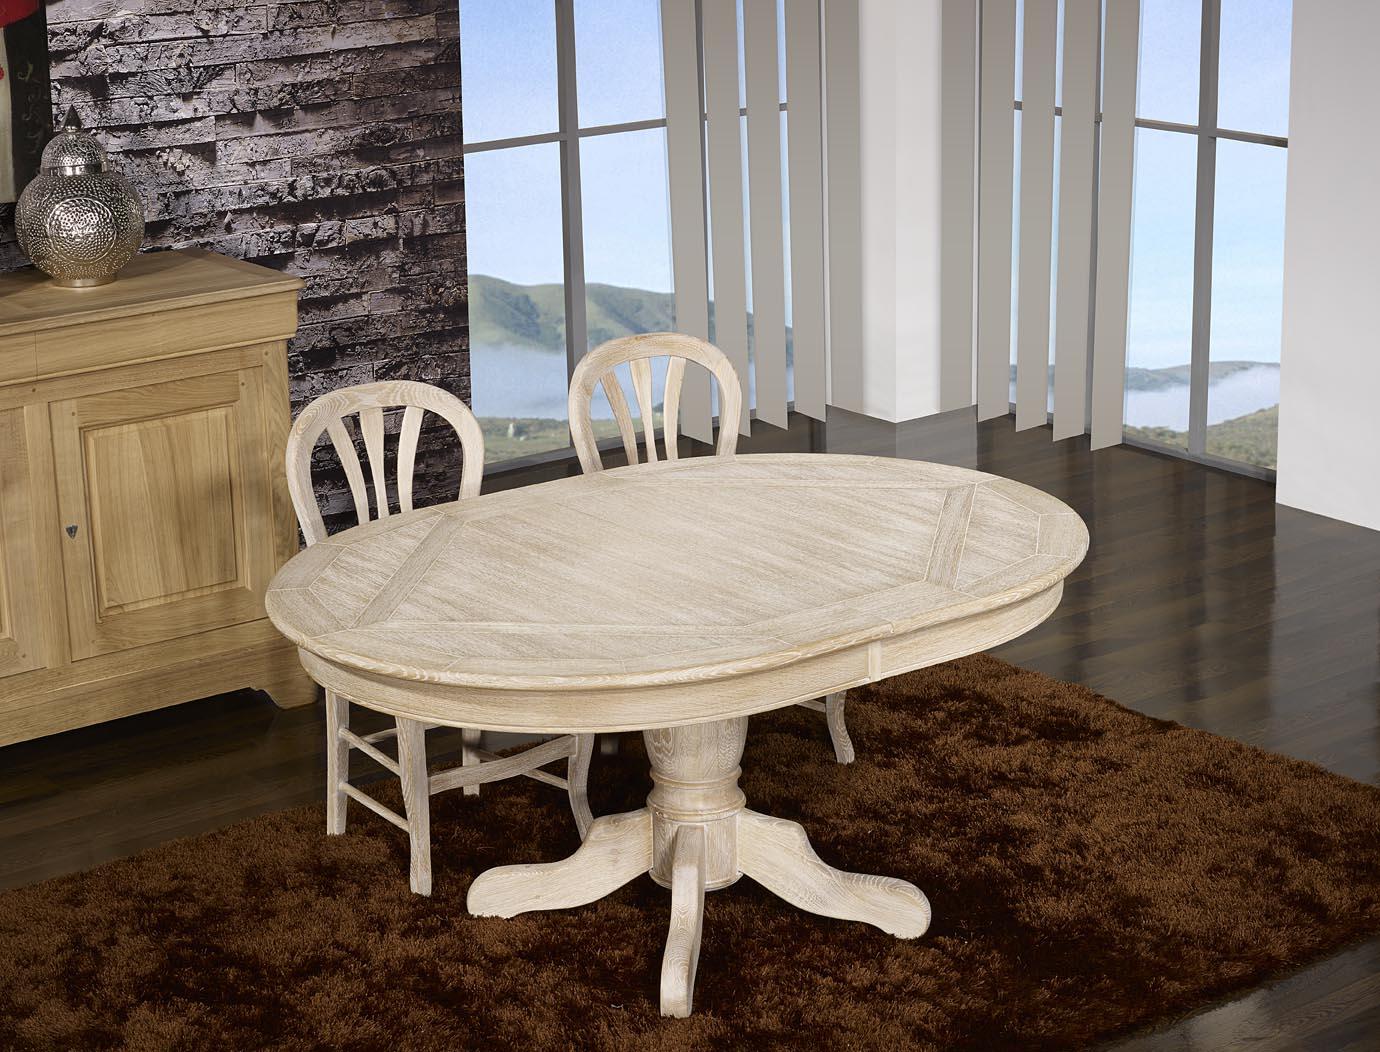 Table ovale 160x120 pied central en ch ne de style louis for Table ronde bois massif pied central